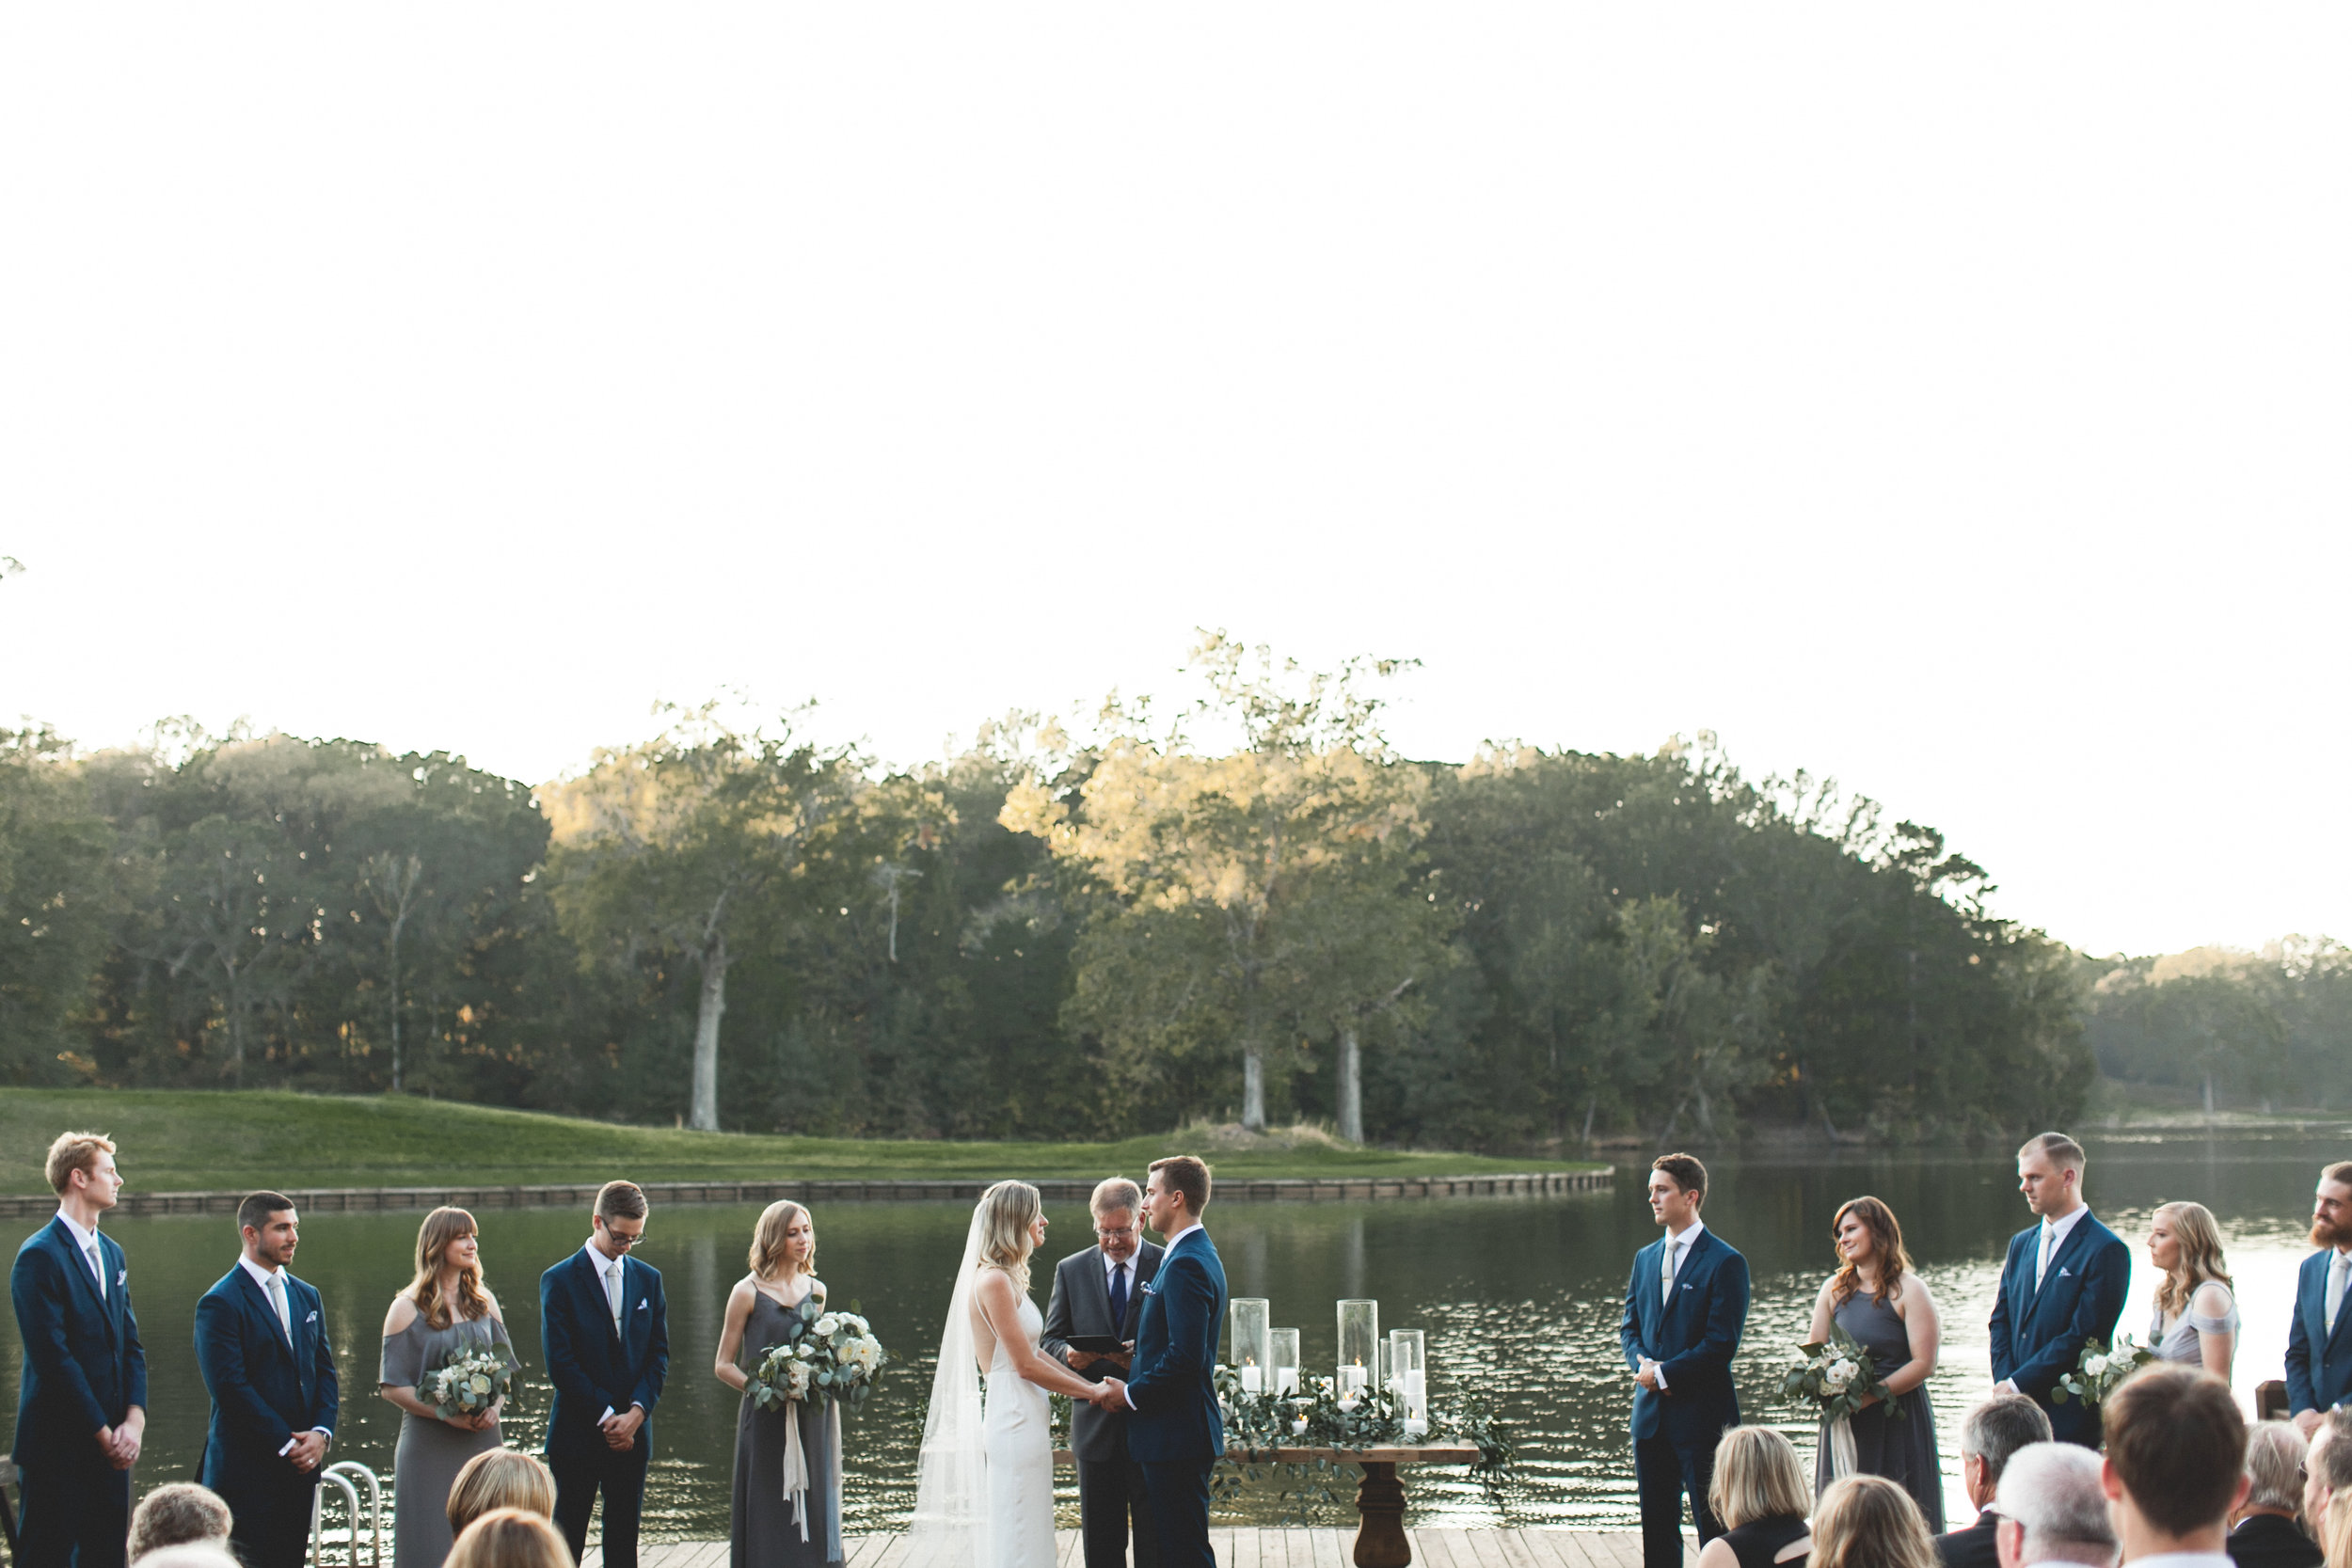 Beth_Garr_Ceremony-178.jpg